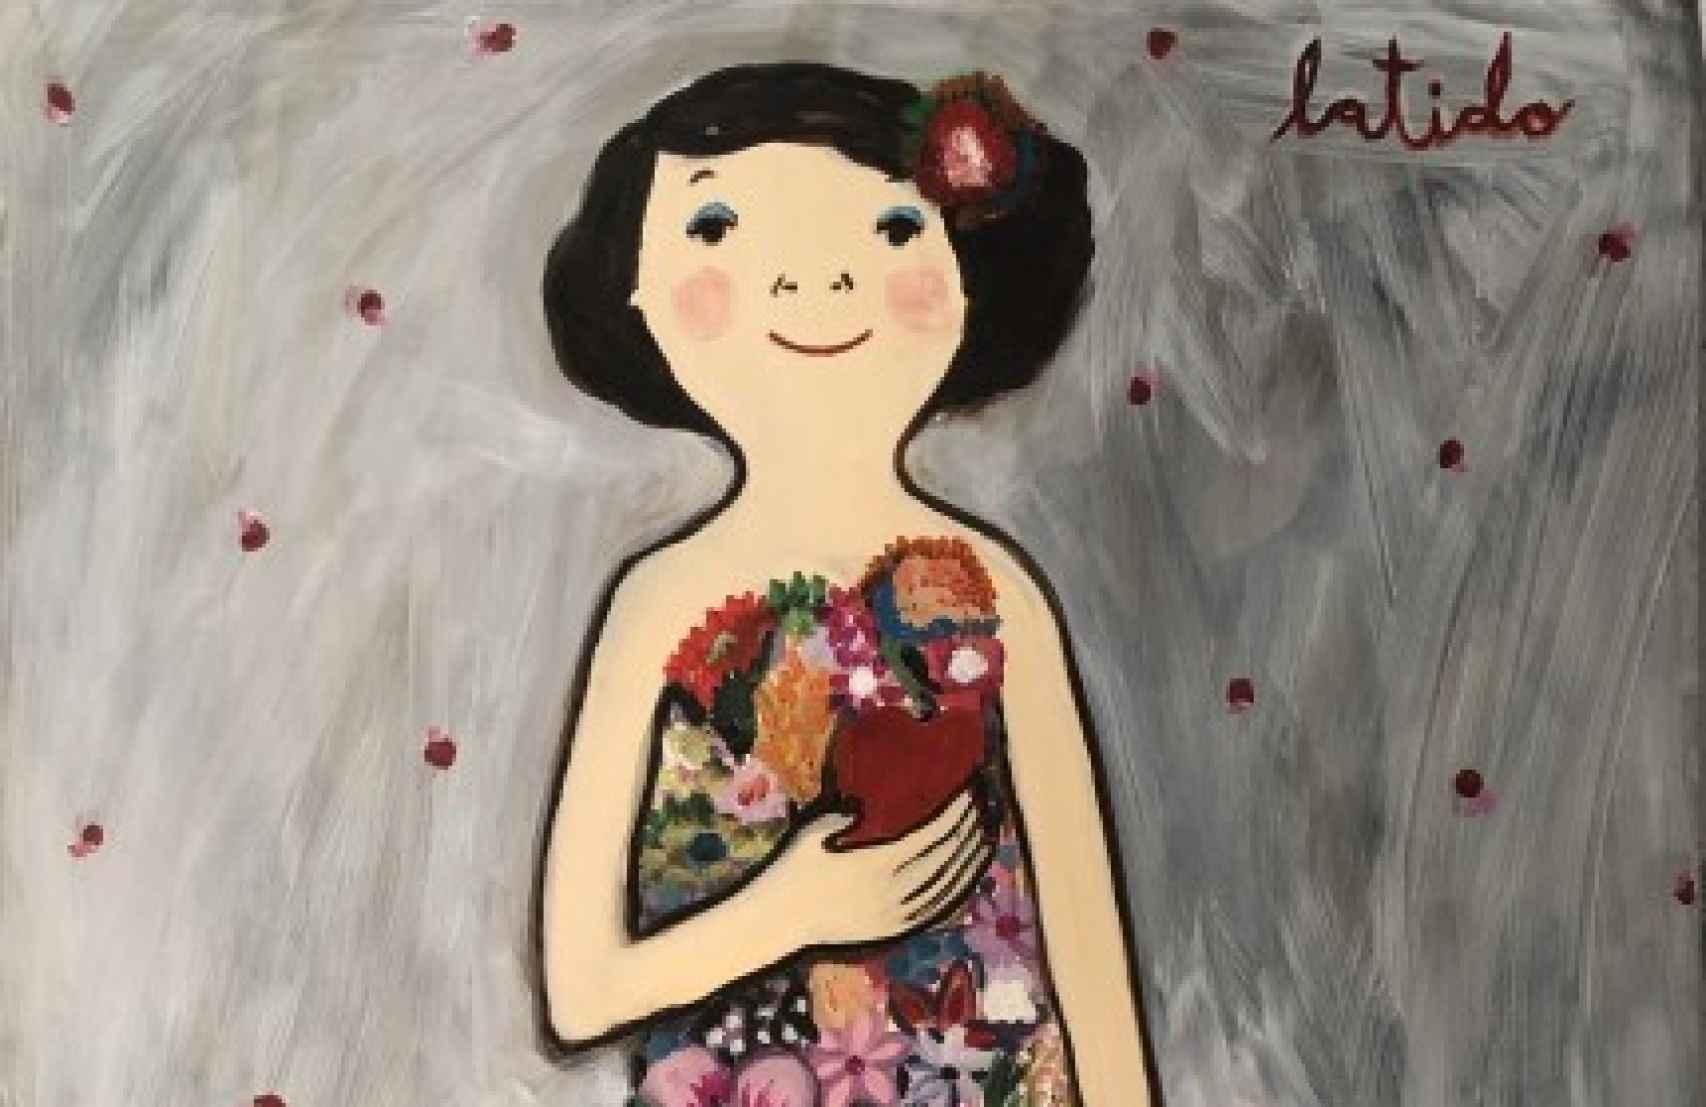 'Latido', de Eva Armisén.